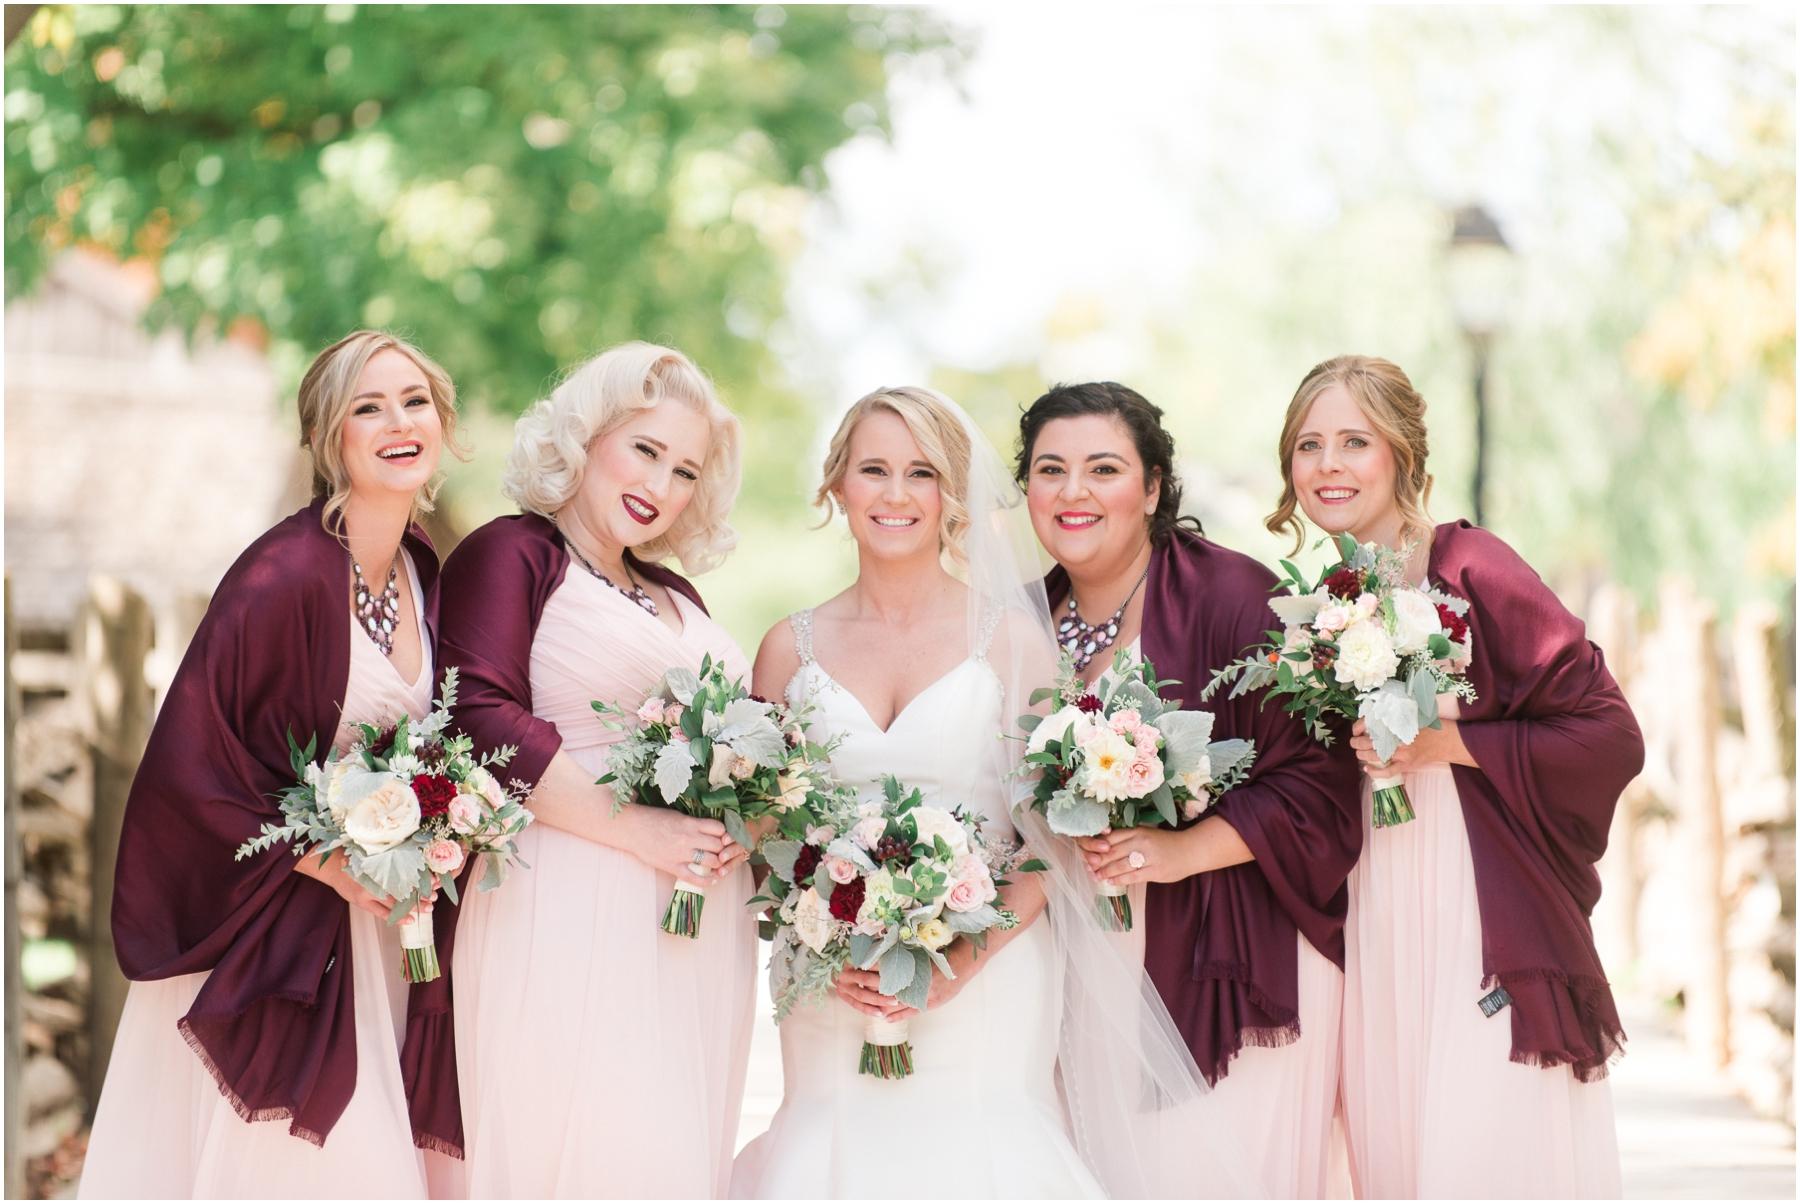 Black Creek Pioneer Village, Toronto Wedding- Precious Photography by Courtney McIntosh Becky & Andy_0139